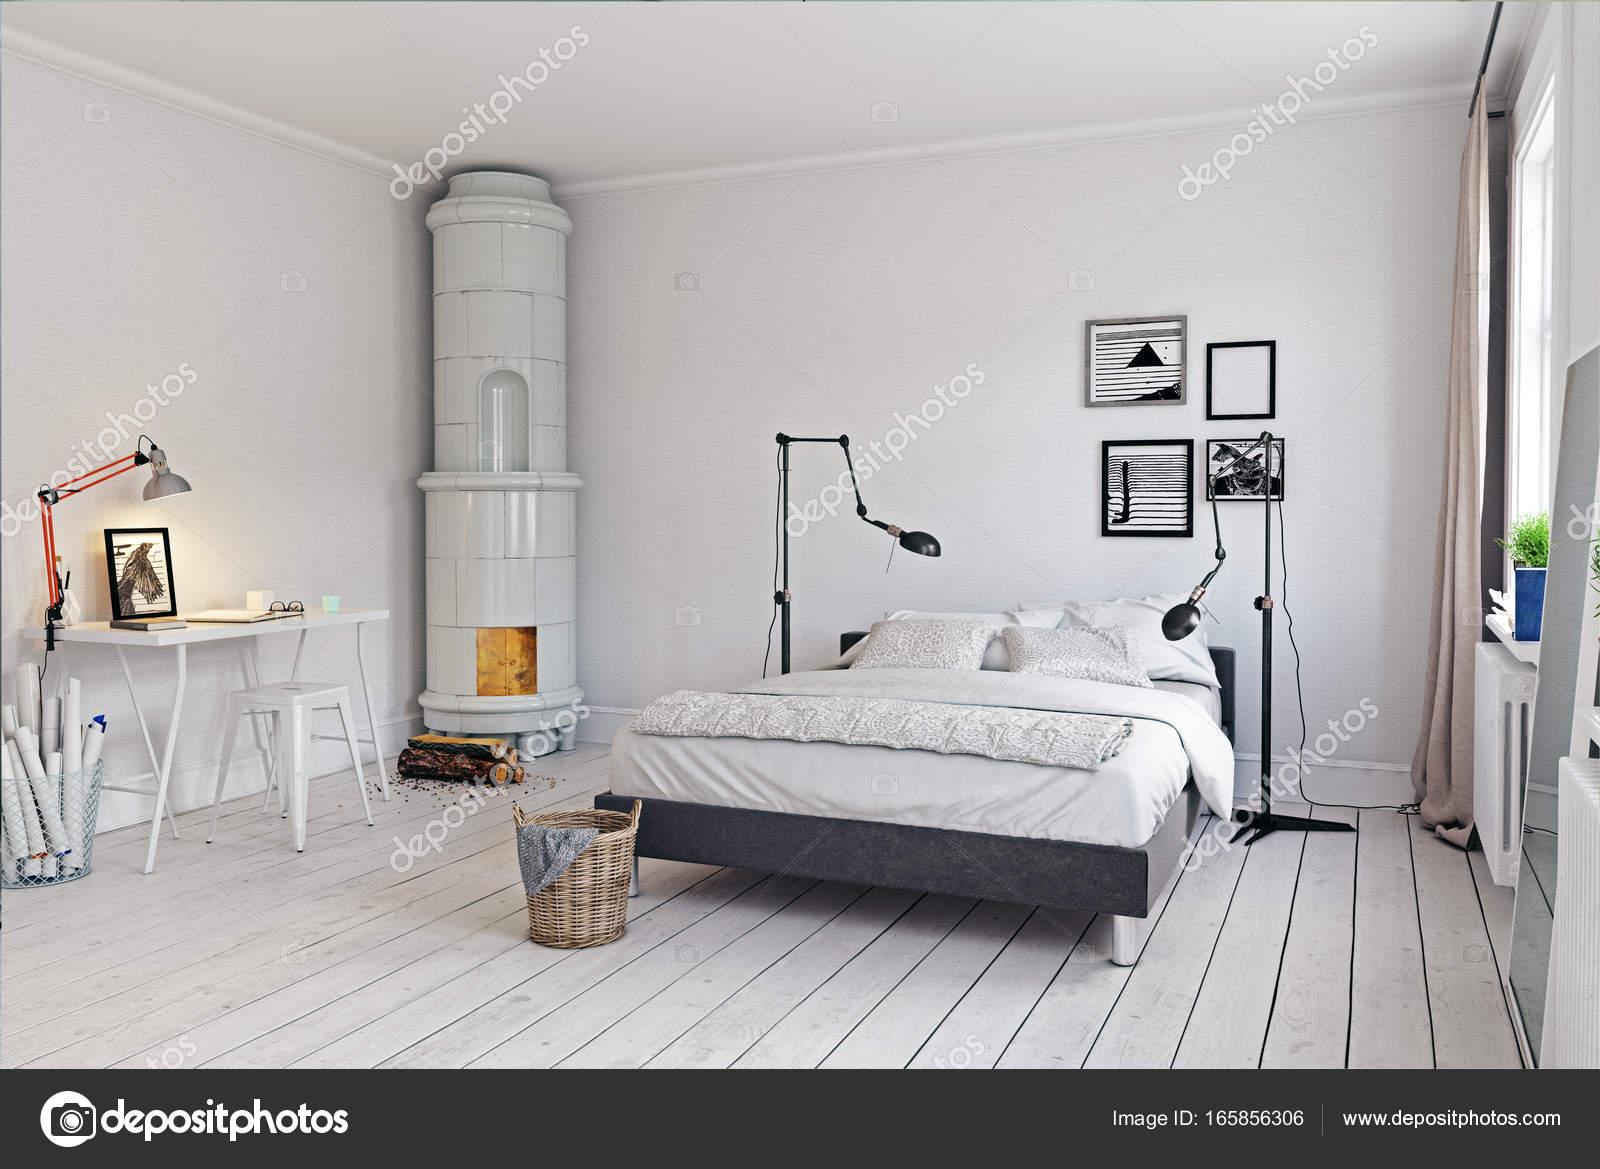 moderne Schlafzimmer-Interieur — Stockfoto © vicnt2815 #165856306